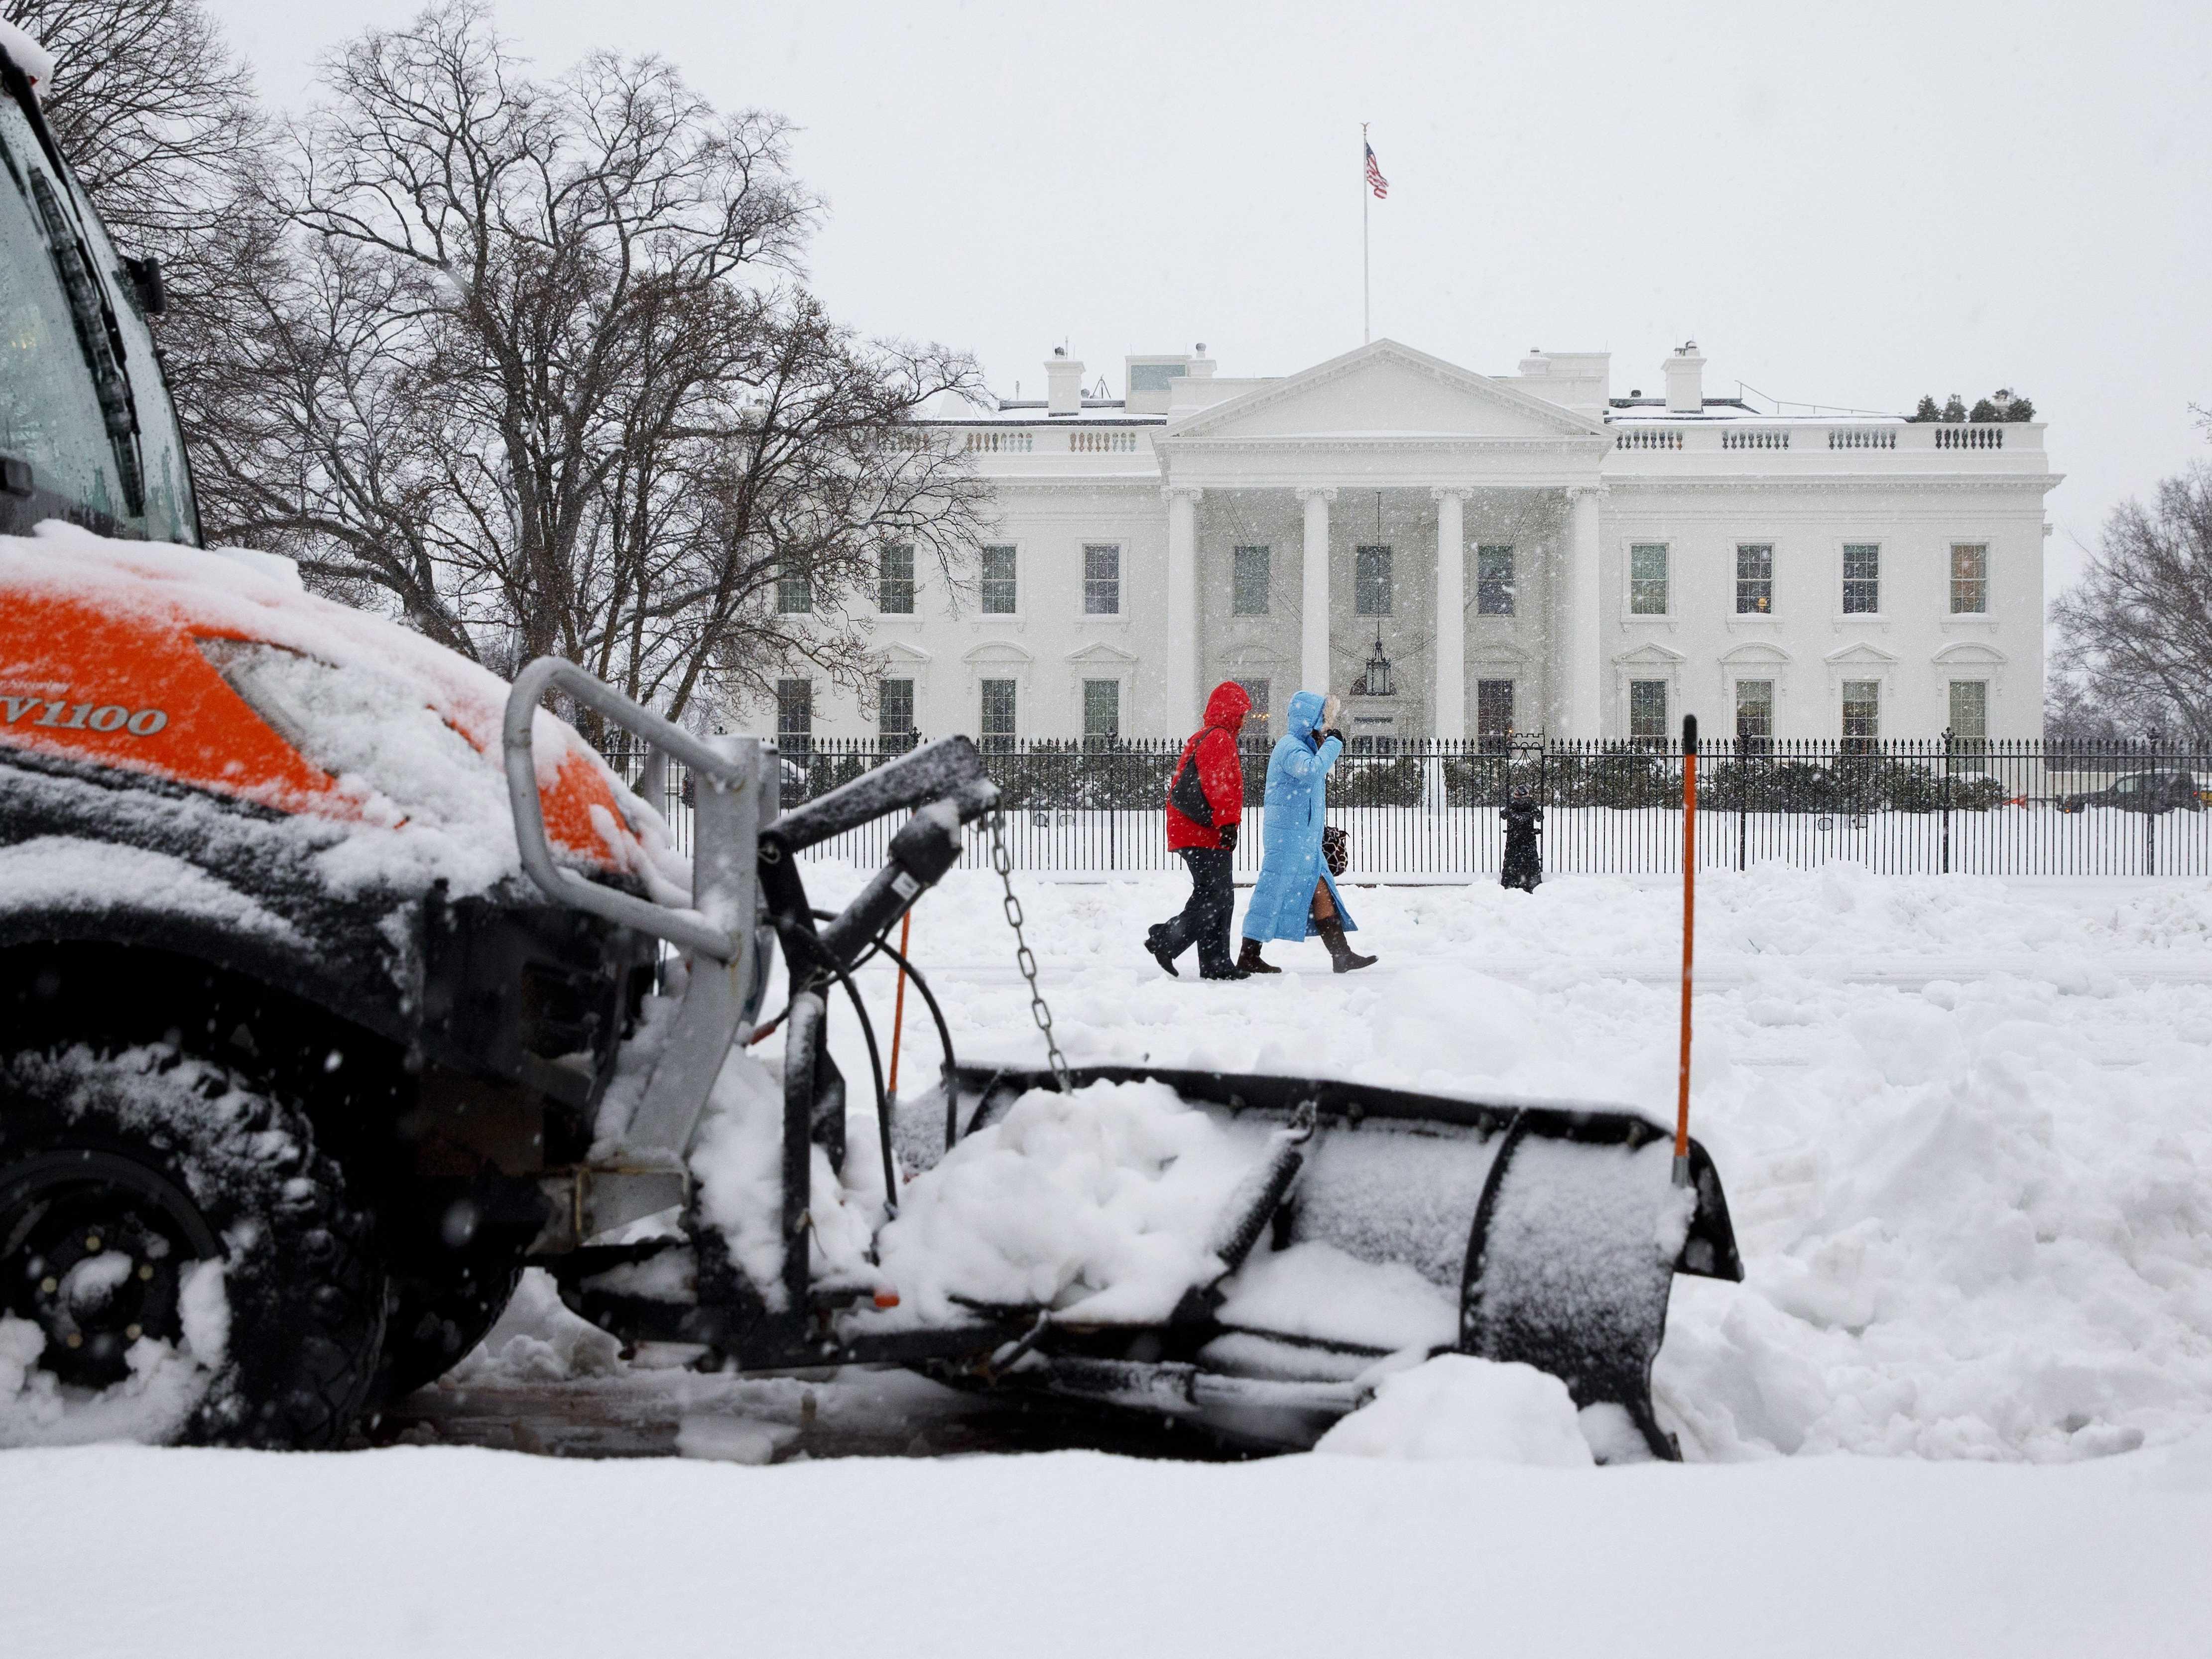 washington-dc-has-a-full-blown-snow-day